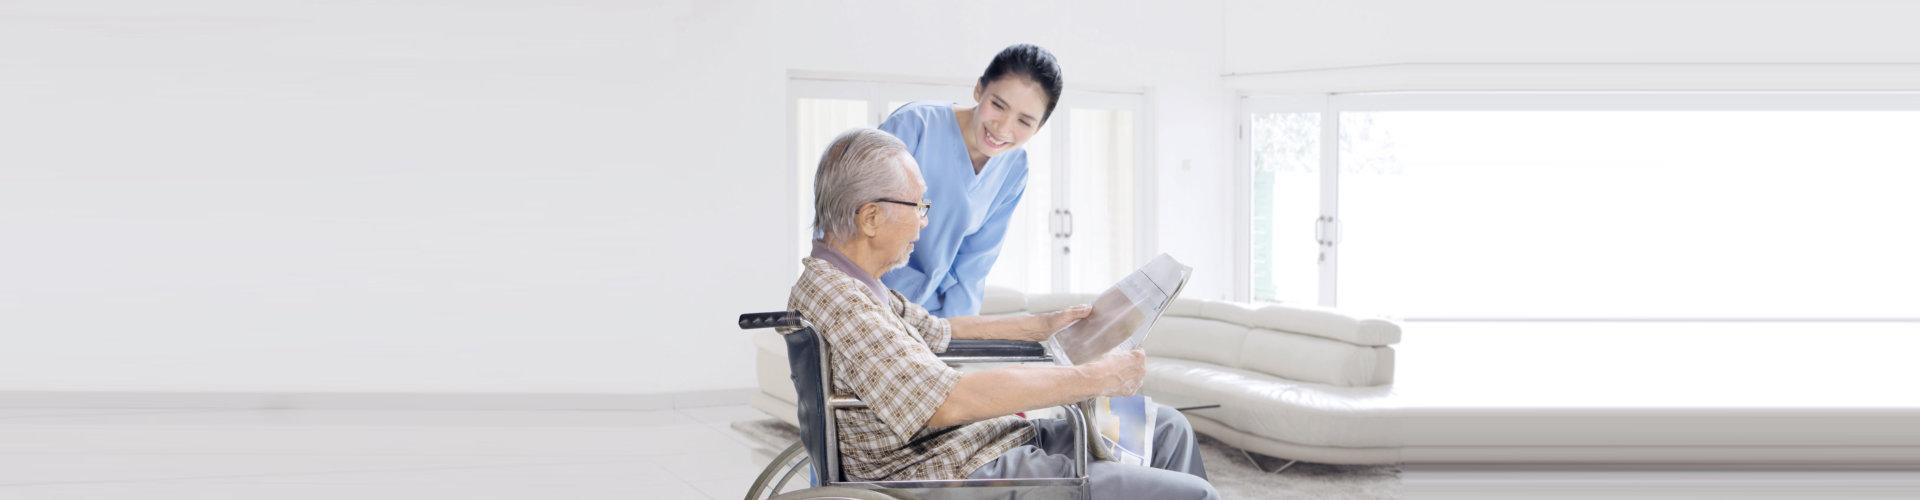 old man and lady nurse talking